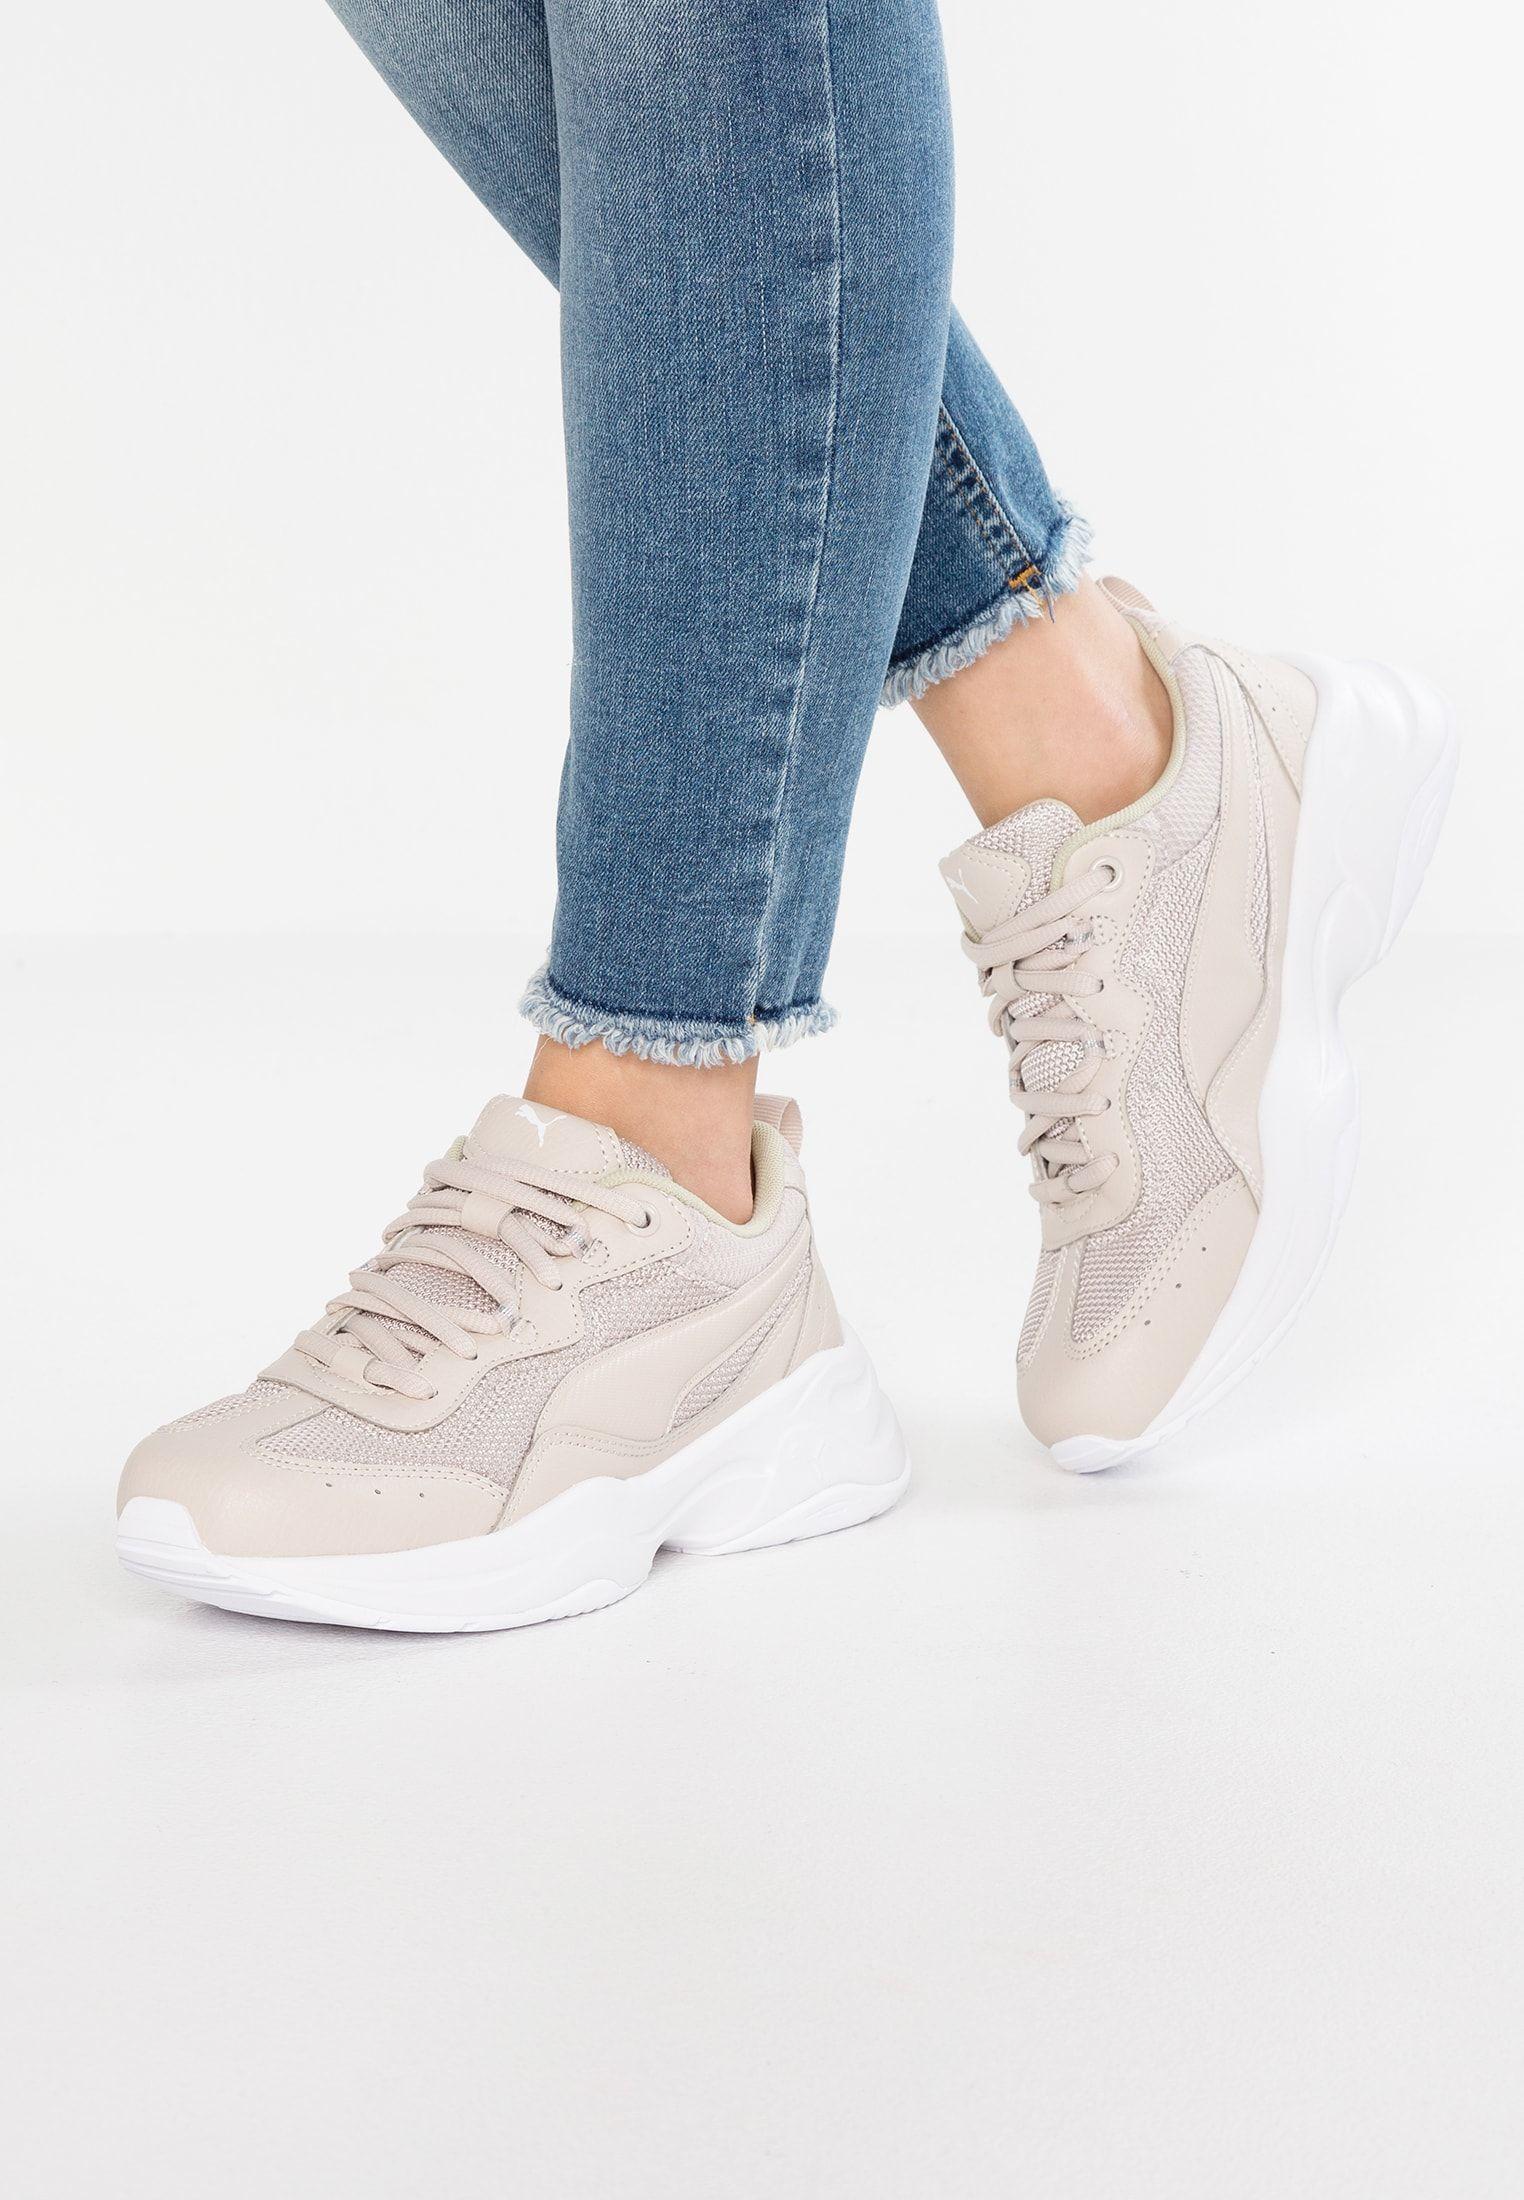 Puma CILIA - Sneakers laag - beige - Zalando.nl | Zapatillas ...